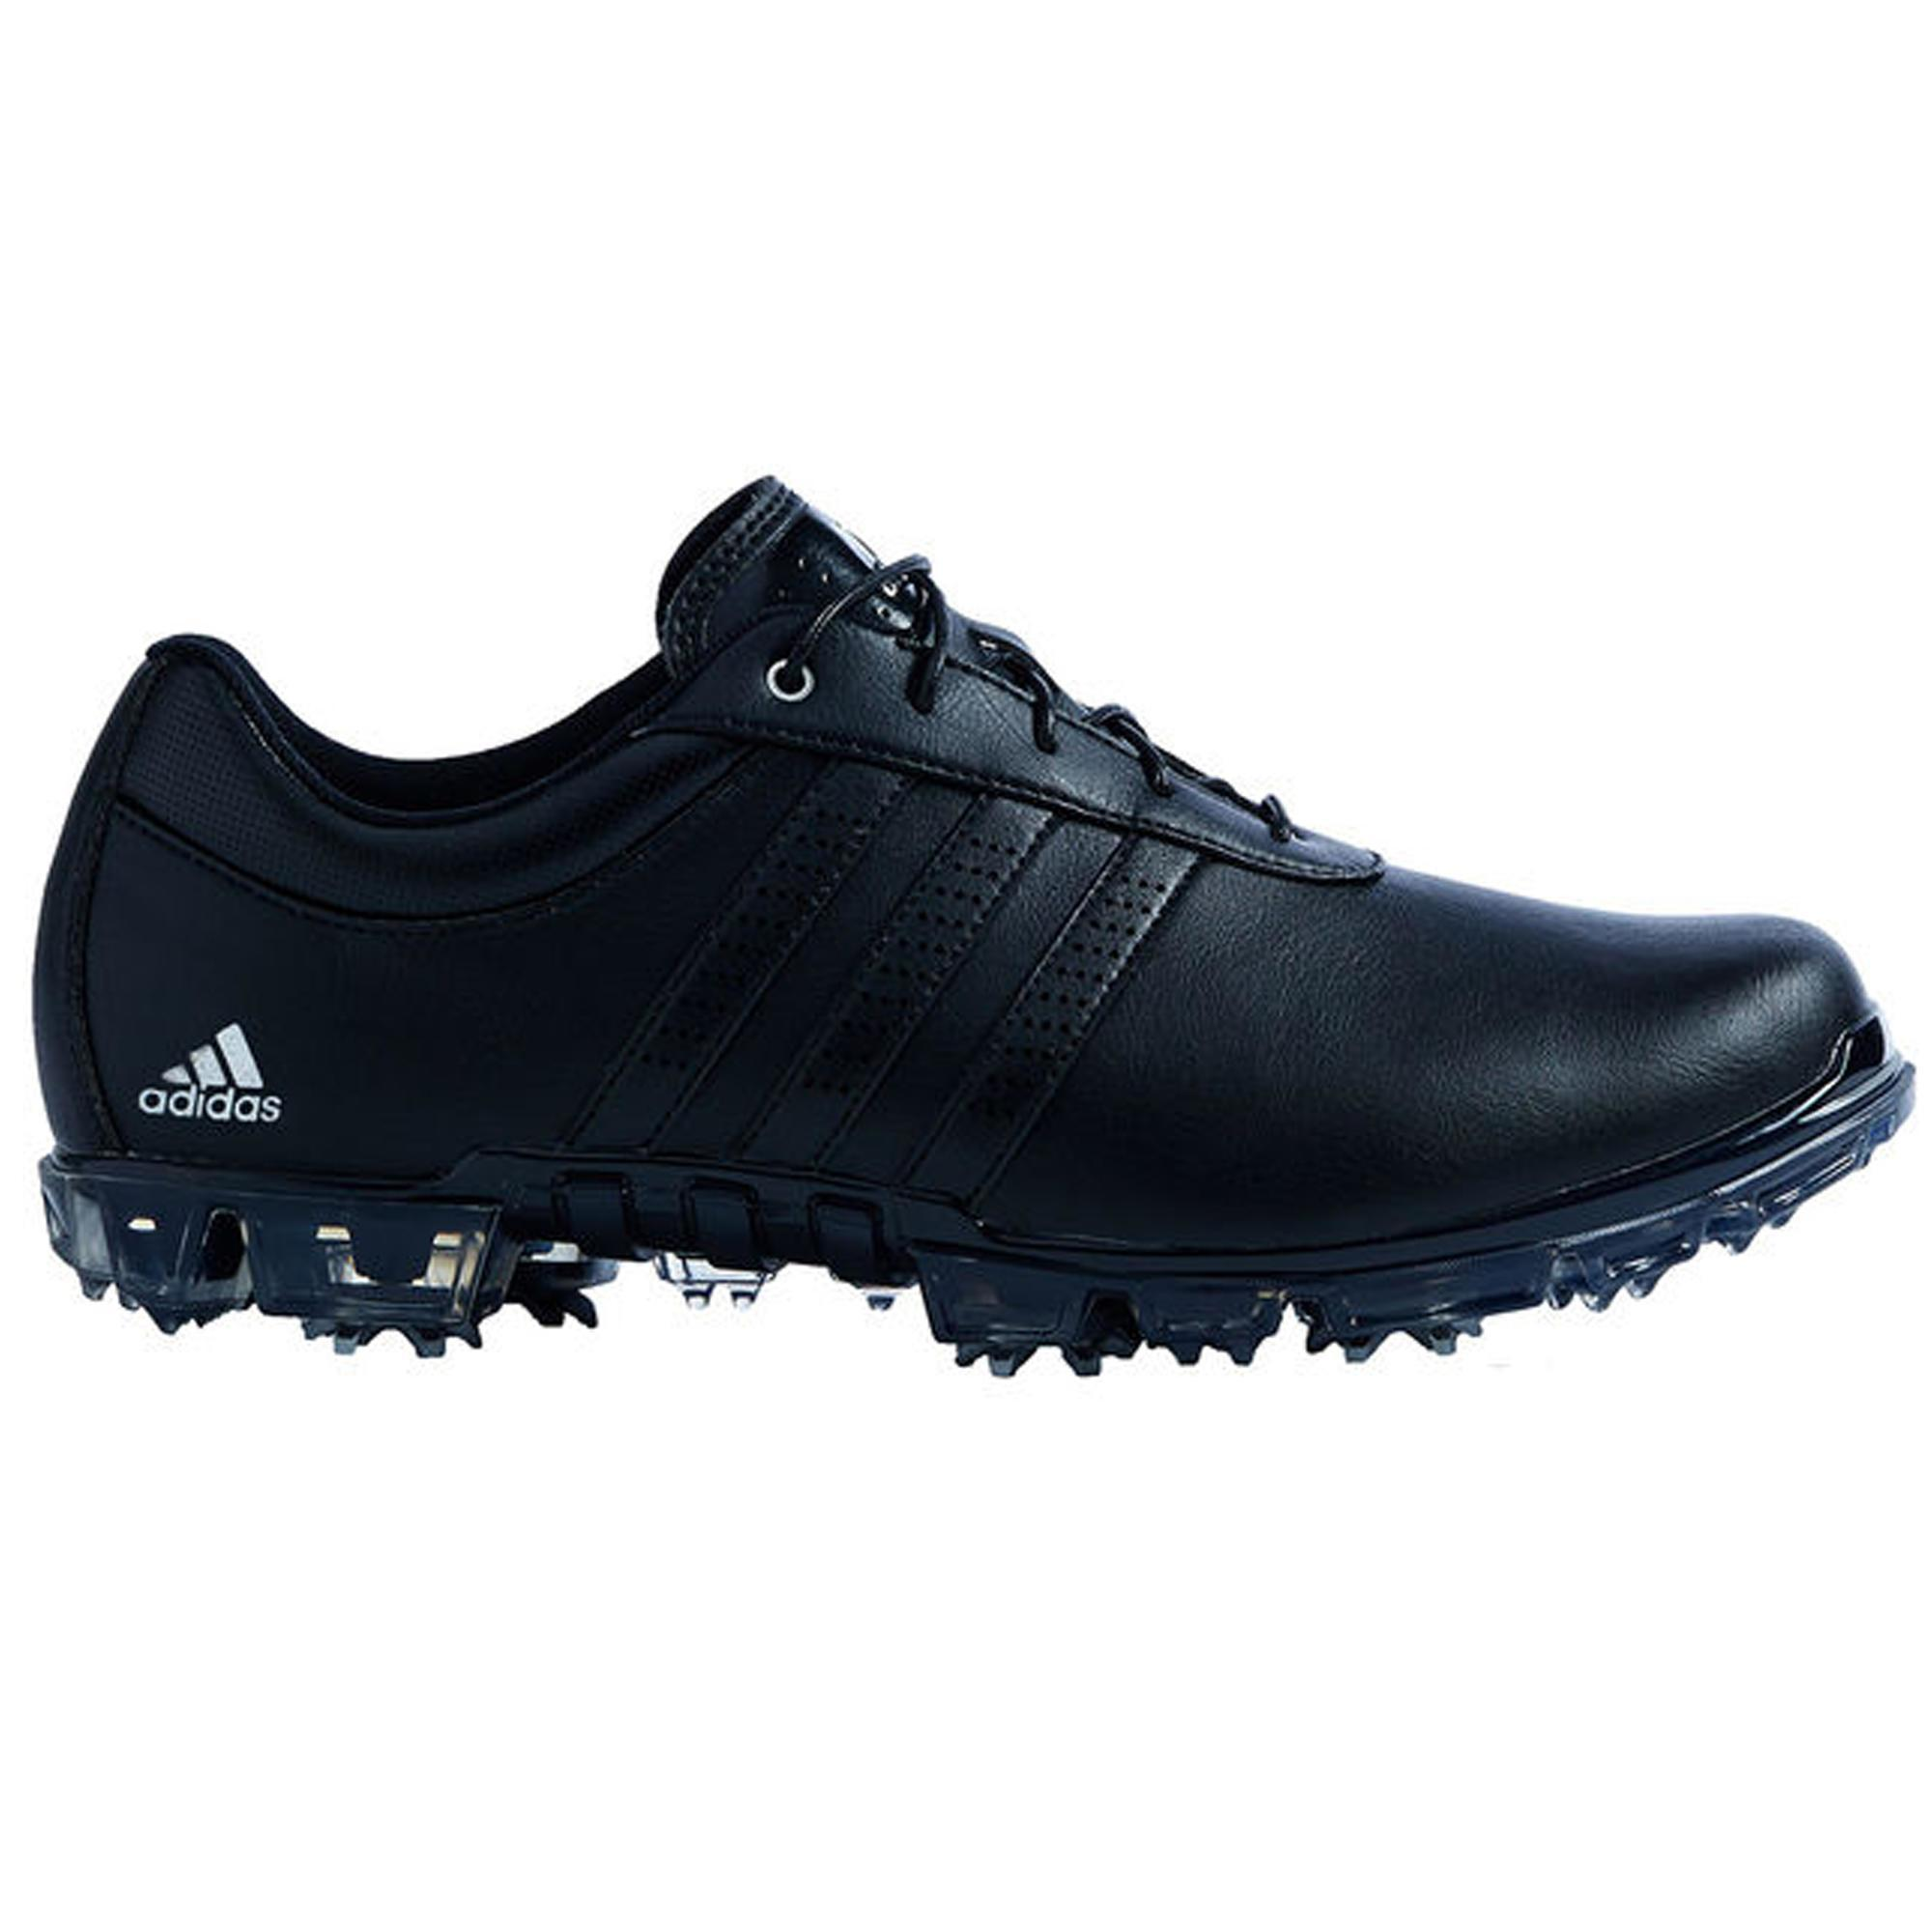 brand new 6bed6 ce406 ZAPATOS GOLF HOMBRE ADIPURE FLEX NEGRO Adidas  Decathlon